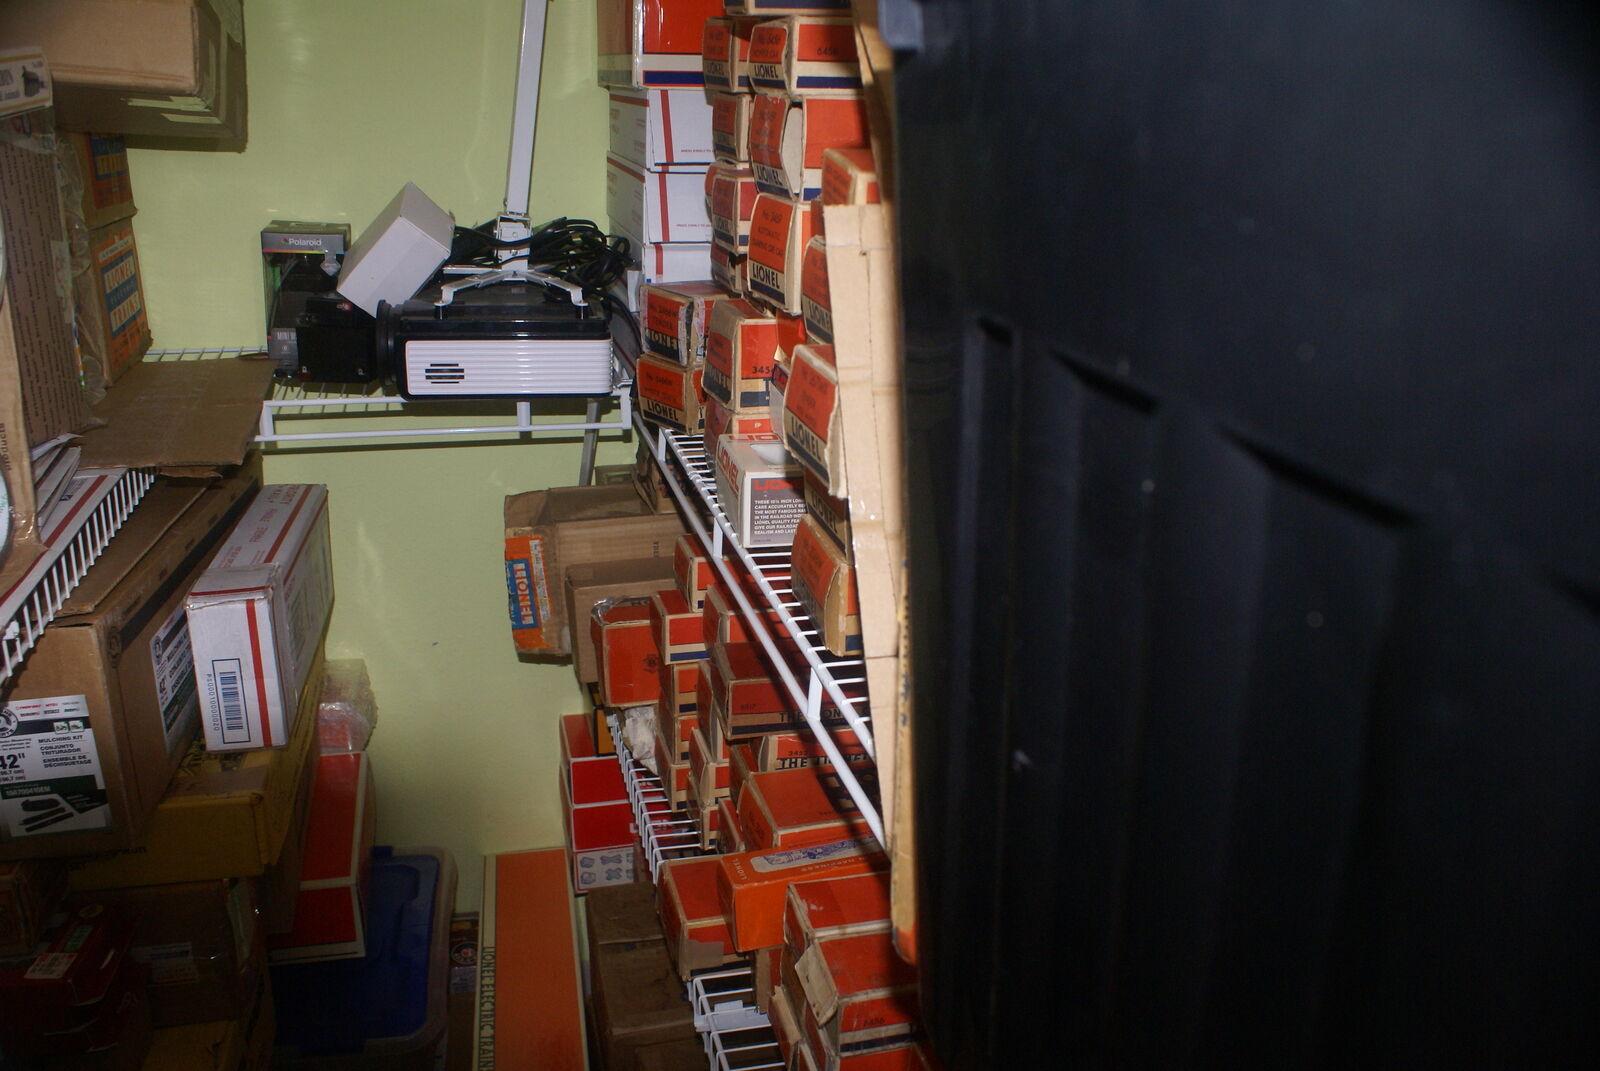 THE HOBO CLOSET